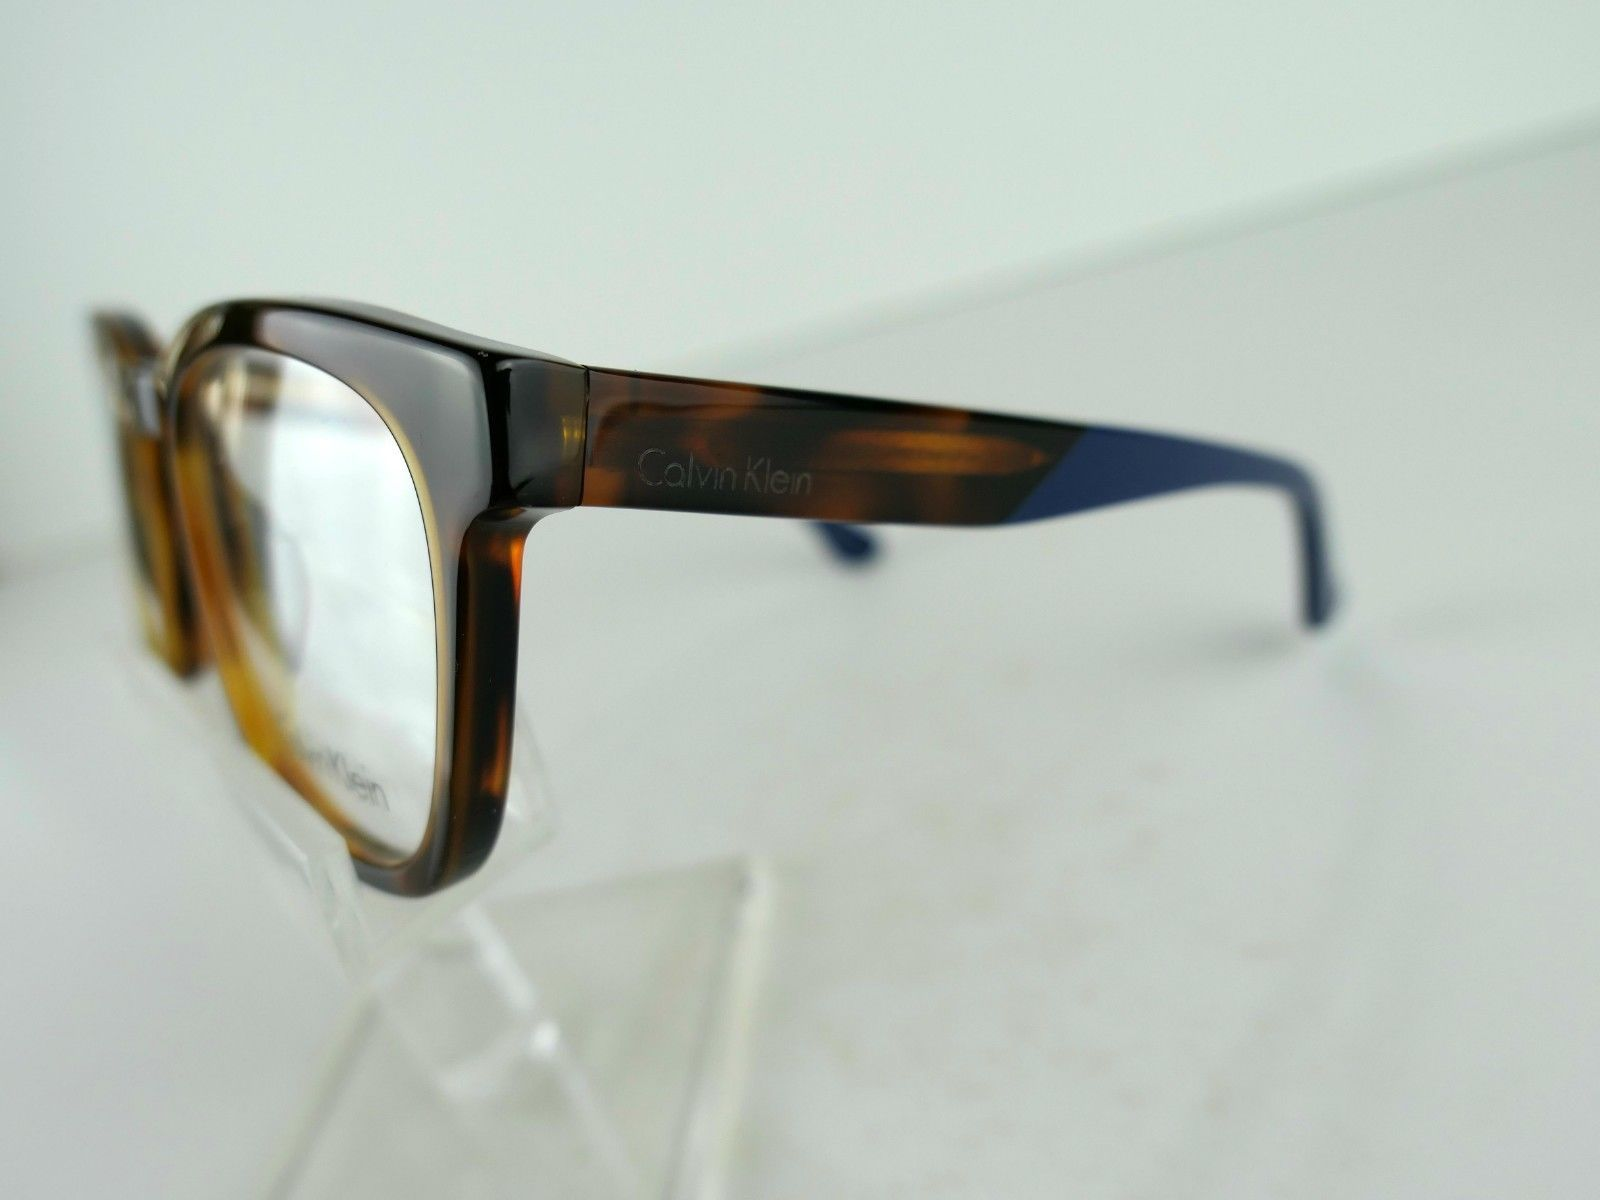 CALVIN KLEIN ck 5942 (211) Tortoise 52 X 18 140 mm Eyeglass Frame